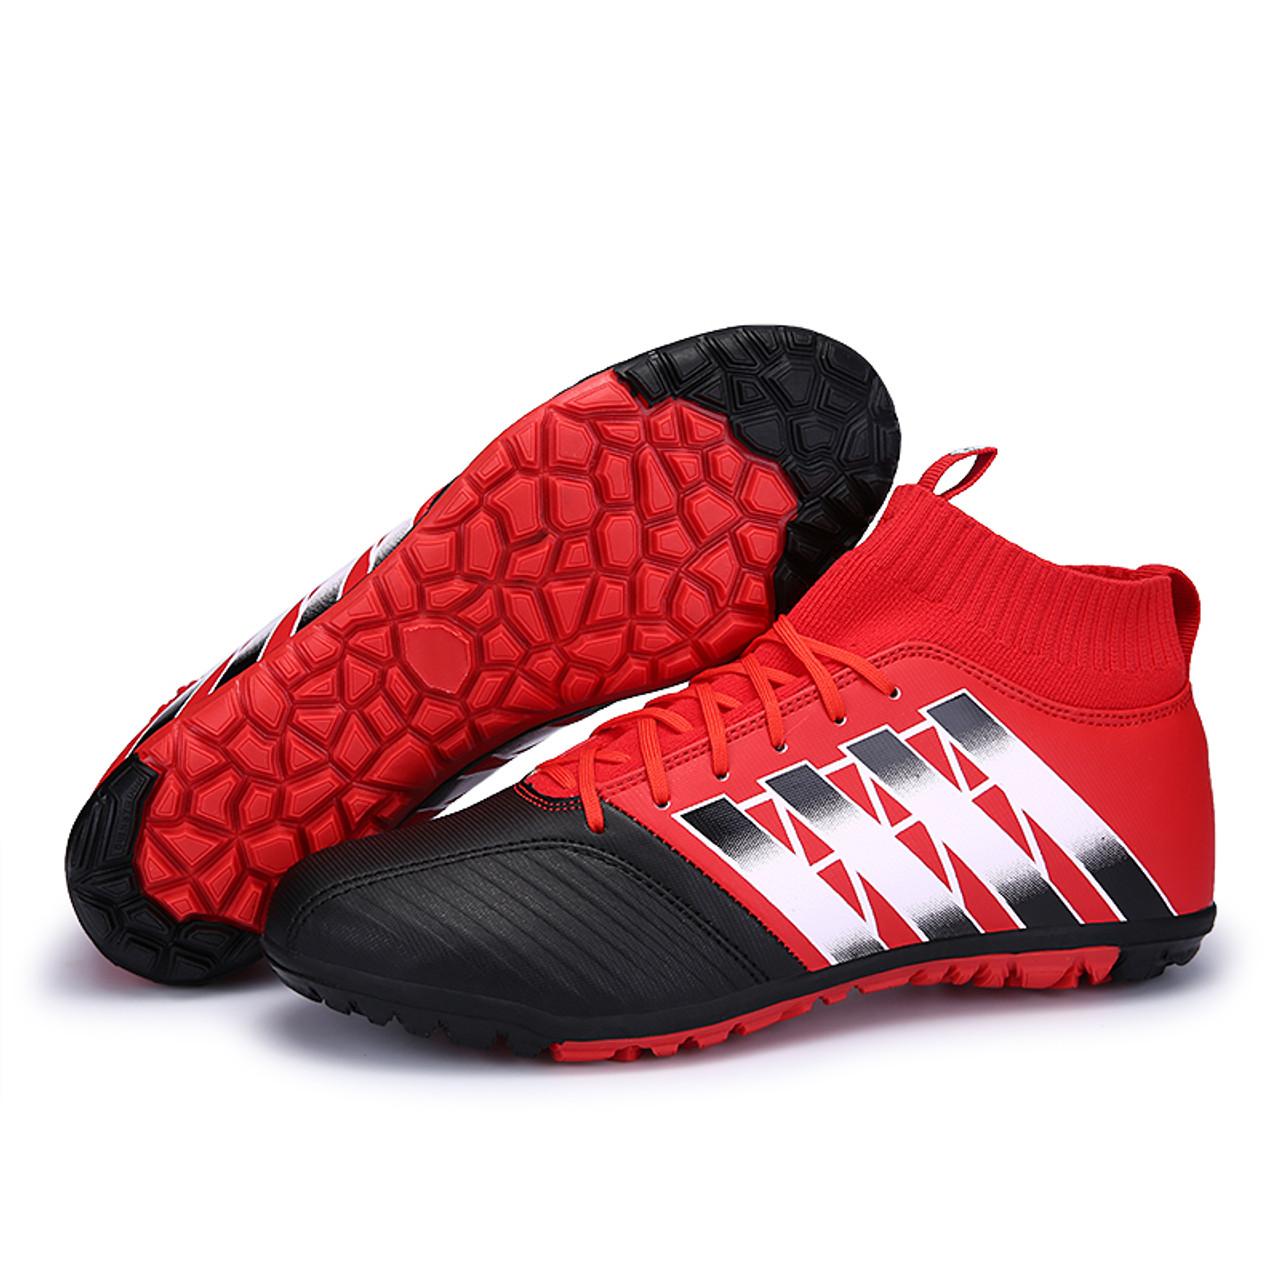 236de0135 ... Men Football Boots High Ankle TF Kids Soccer Shoes Children Indoor  Futsal Hard Wearing Boy Sock ...